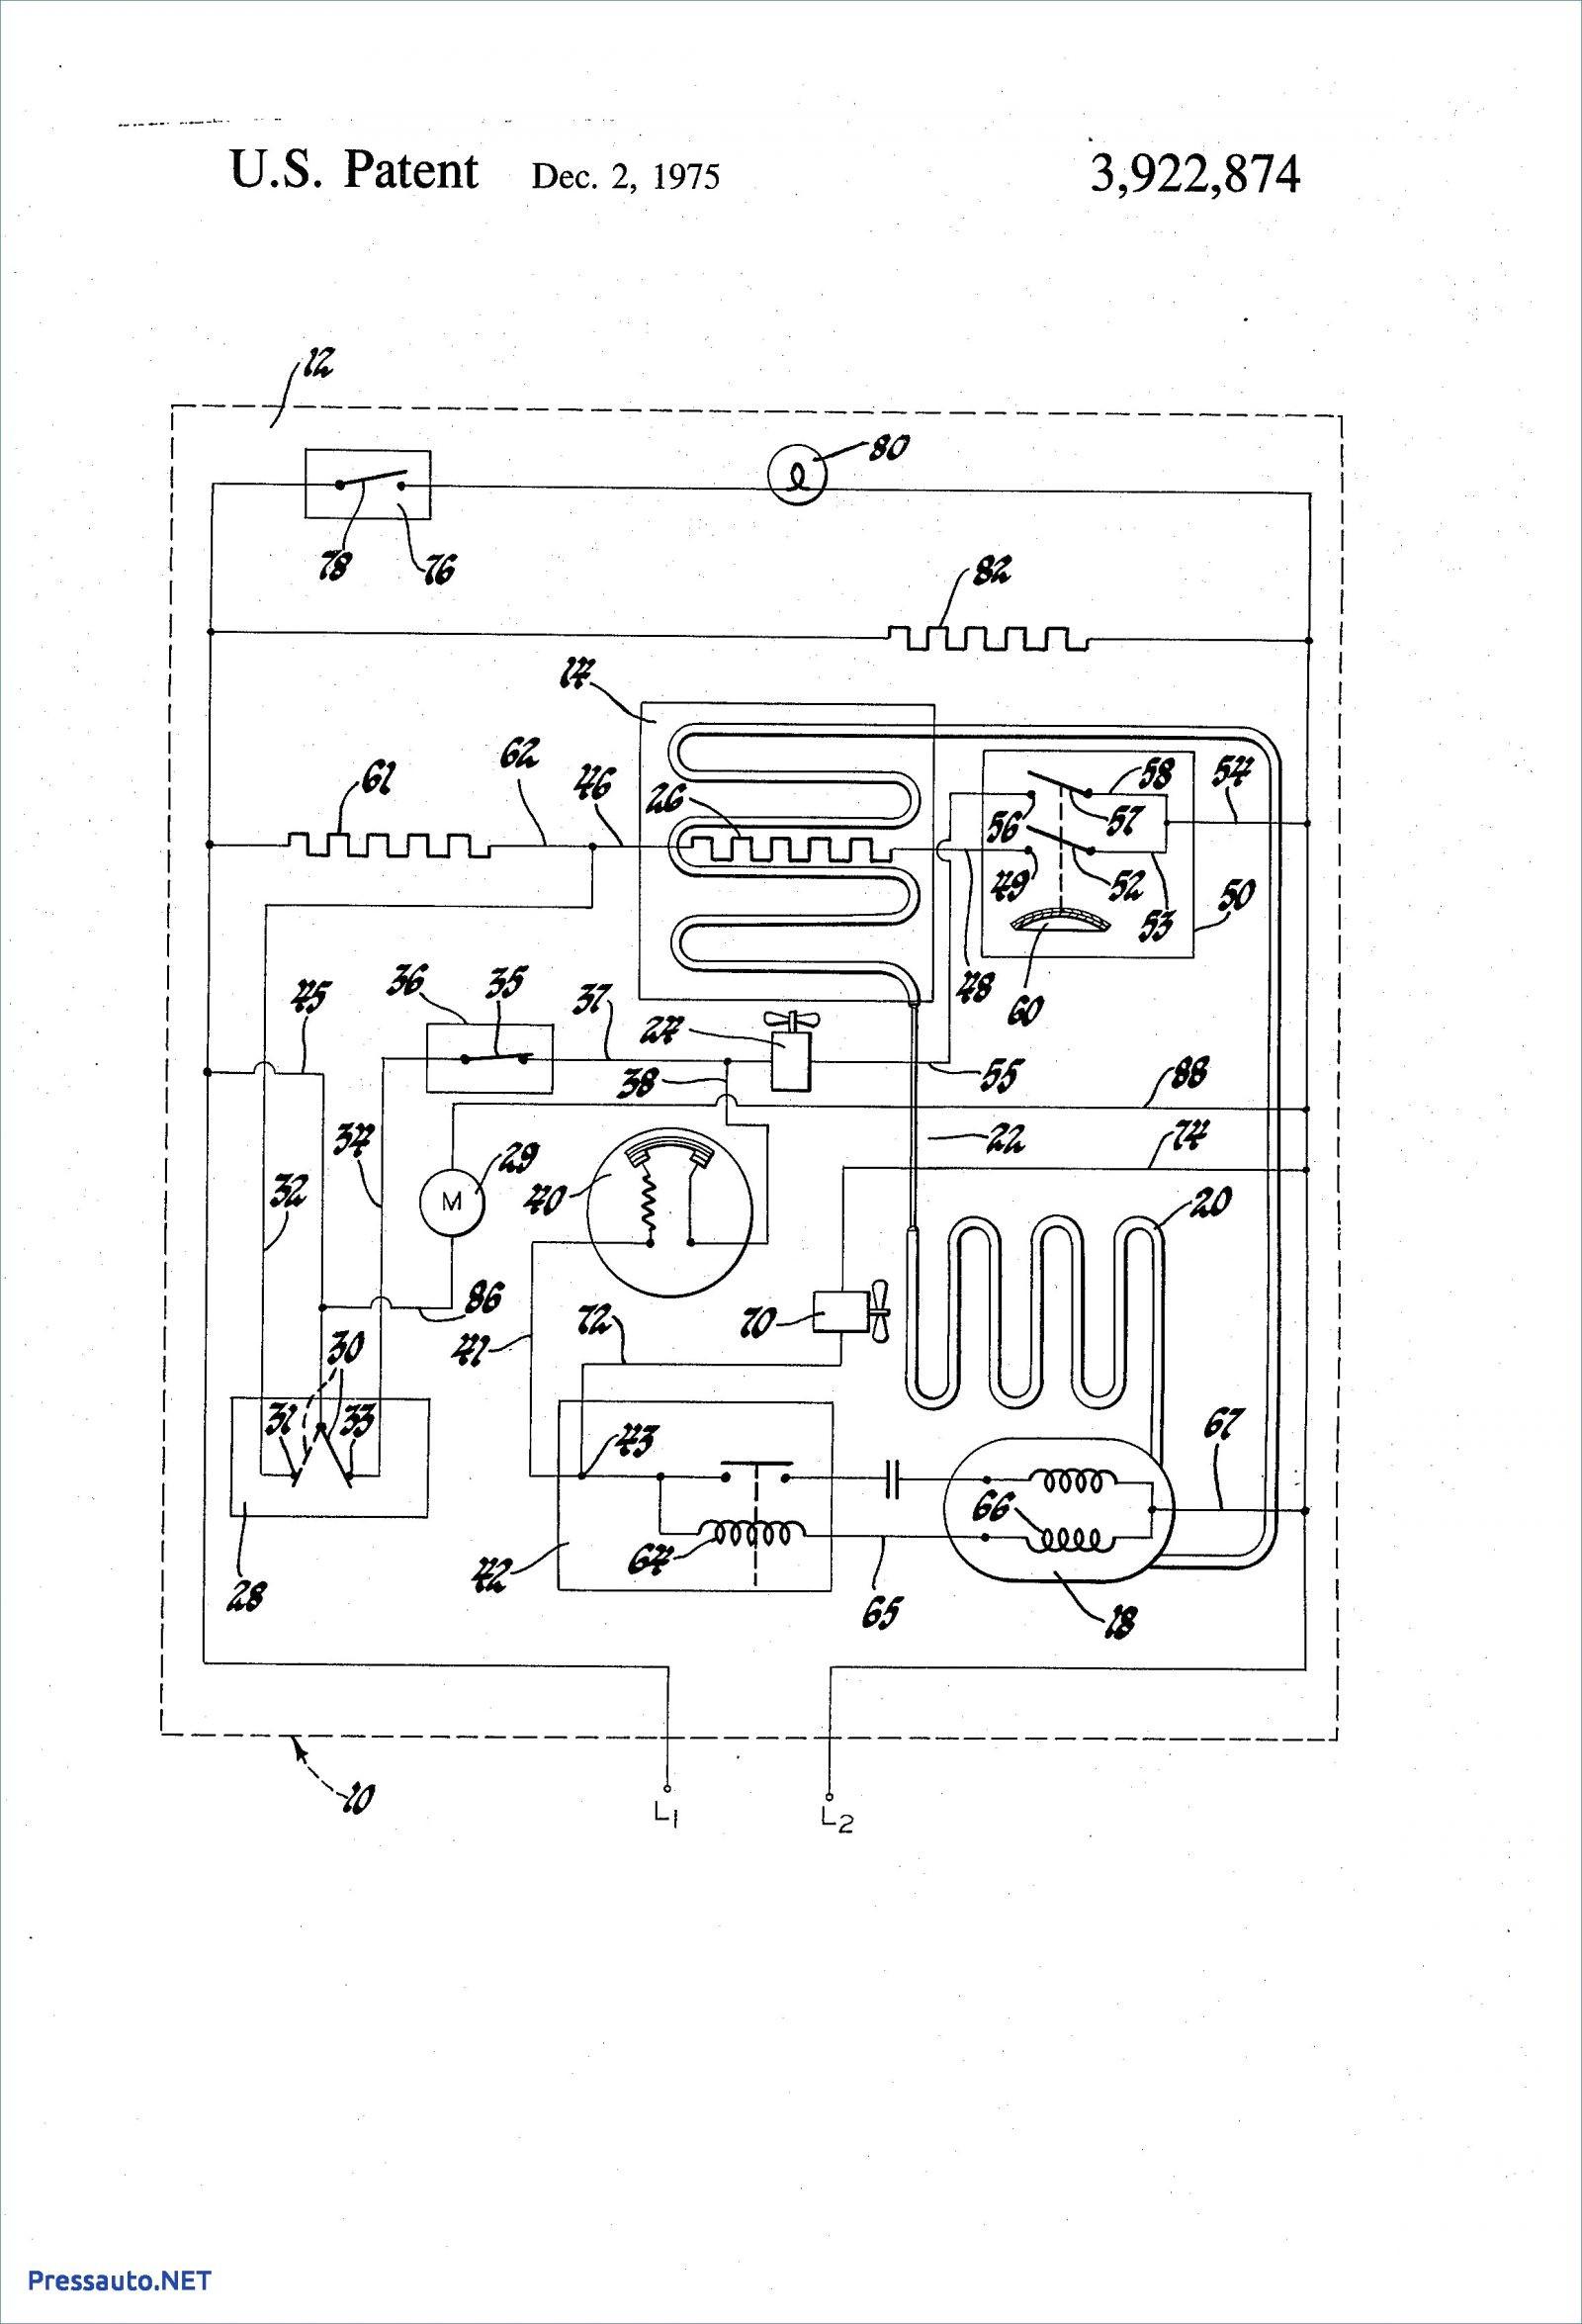 Trane Xl1200 Heat Pump Wiring Diagram Solutions Electrical Schematic Beckett Burner Parts